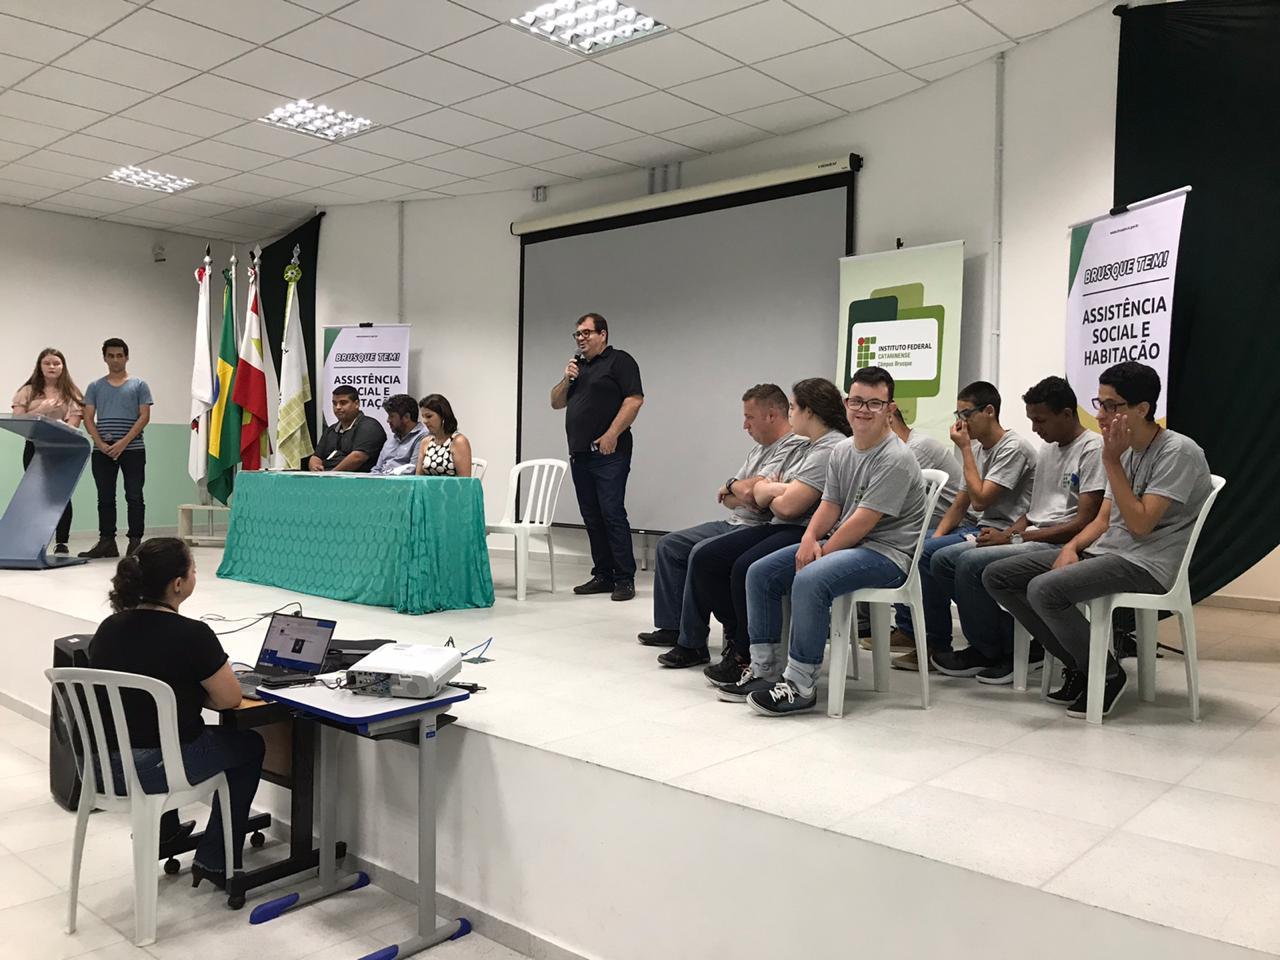 Formatura dos alunos do curso Luz do Saber aconteceu na sexta-feira (8)